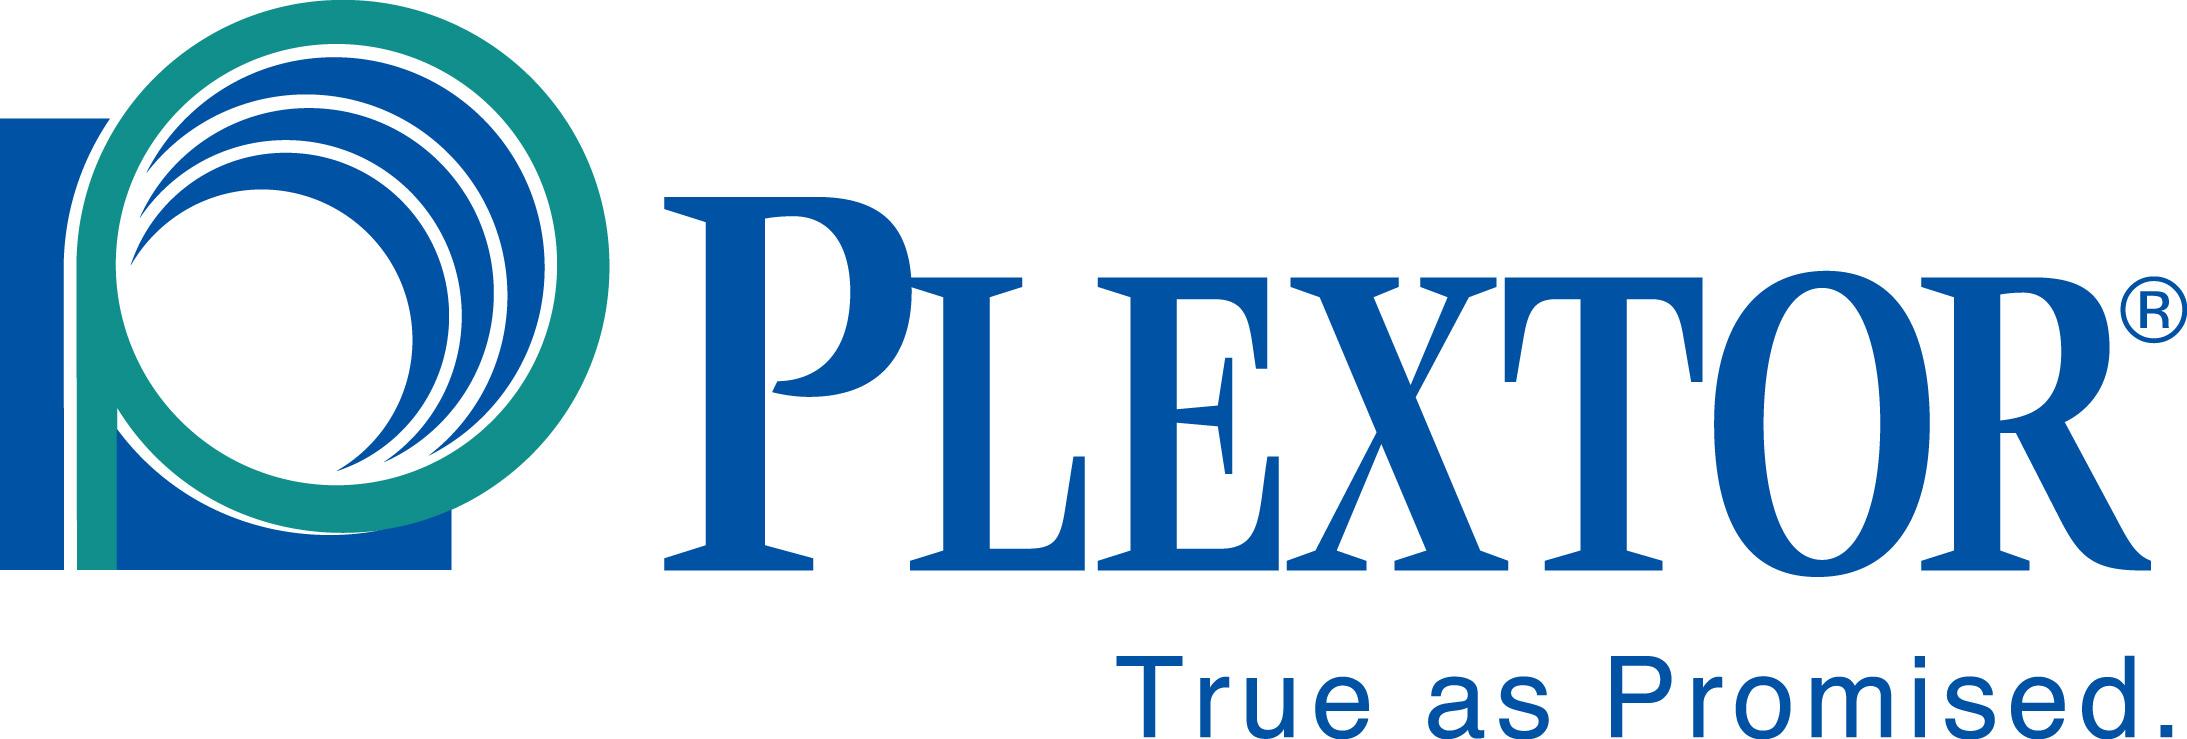 PLEXTOR軟硬兼施 全力出擊! Computex 2015展現強大研發實力  目睹M7e與PlexTurbo 3、PlexVault、PlexCompressor三大獨家技術風采